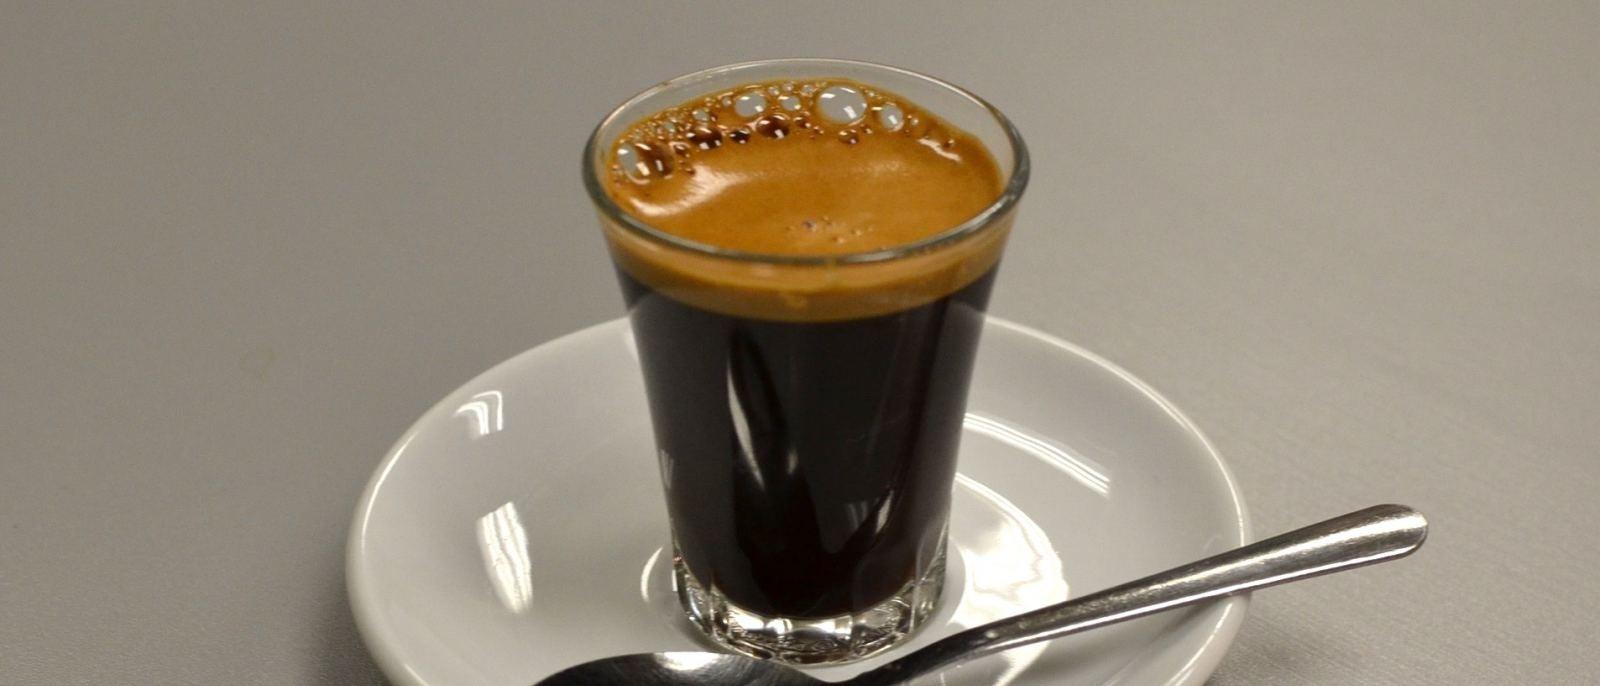 Espresso at Endorffeine   |  Photo: Joshua Lurie